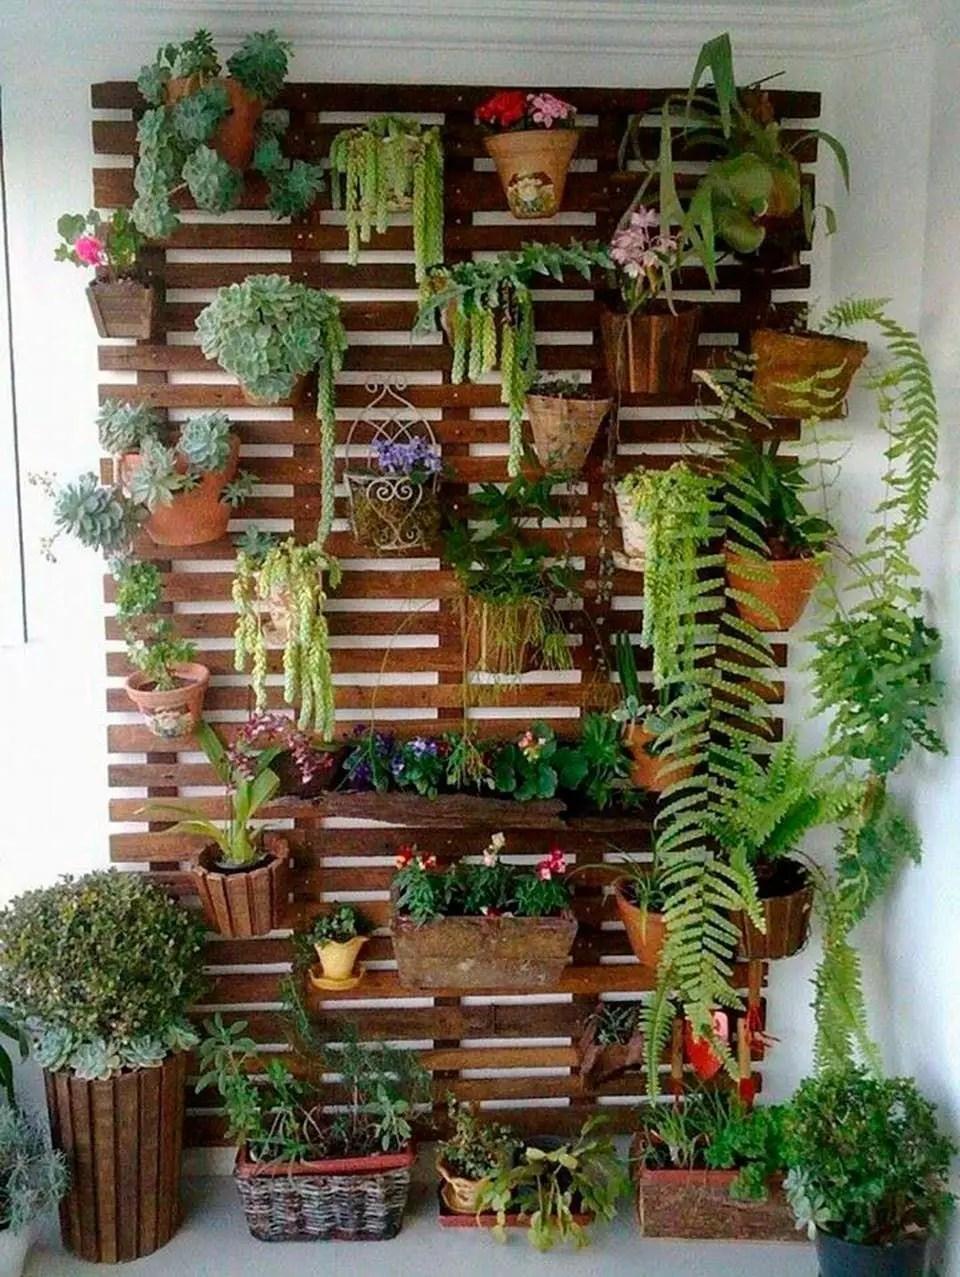 Creative small balcony design ideas for spring 11